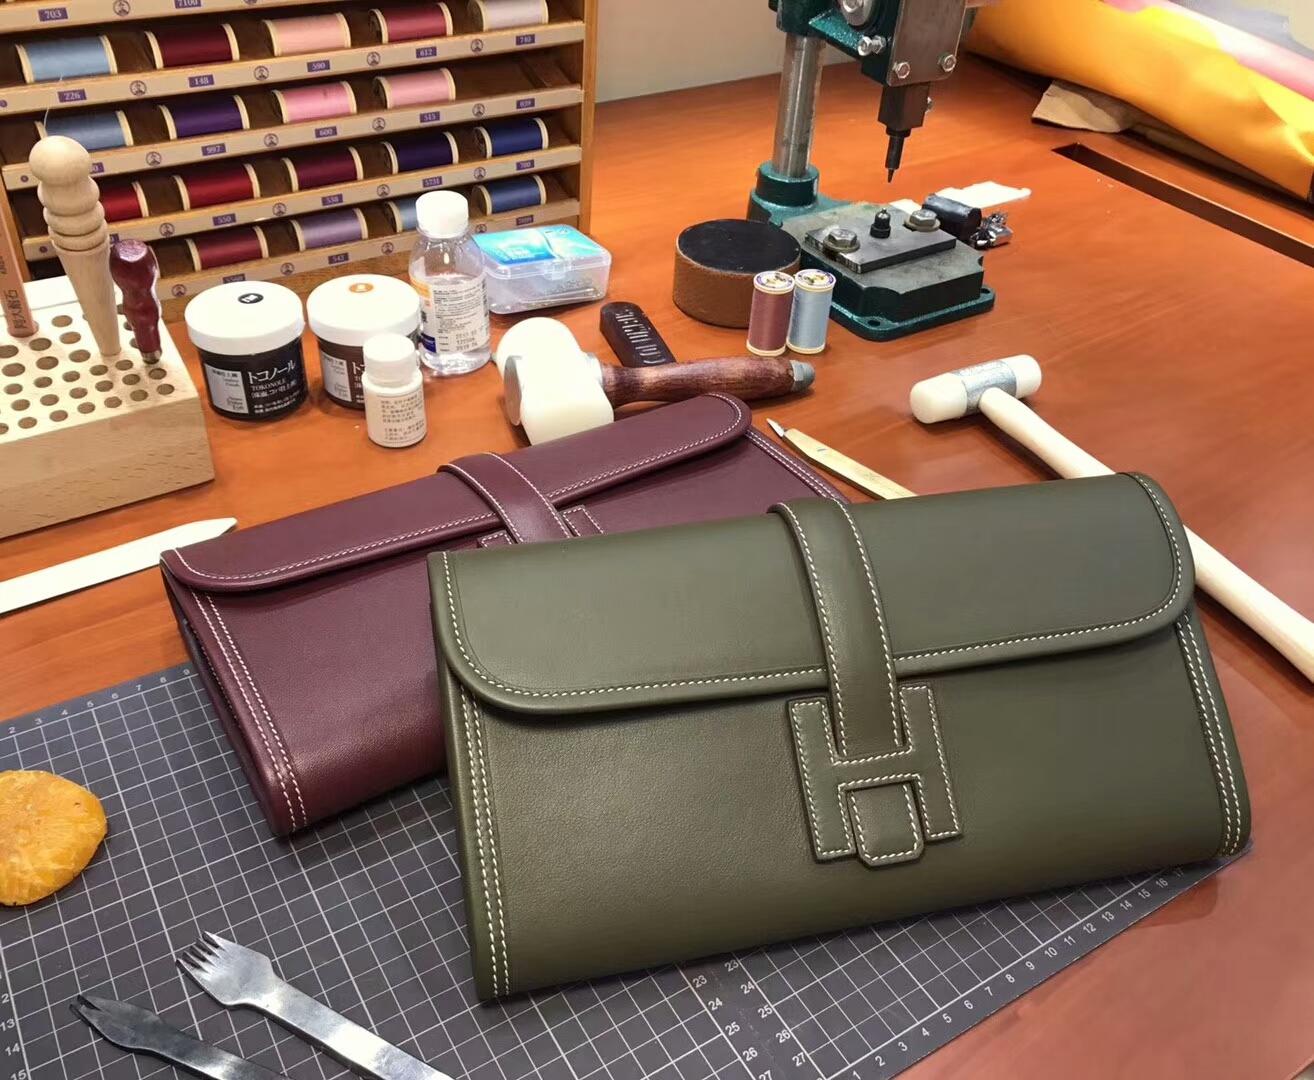 6H 橄榄绿 Vert Veronese HERMES 爱马仕 手包 配全套专柜原版包装